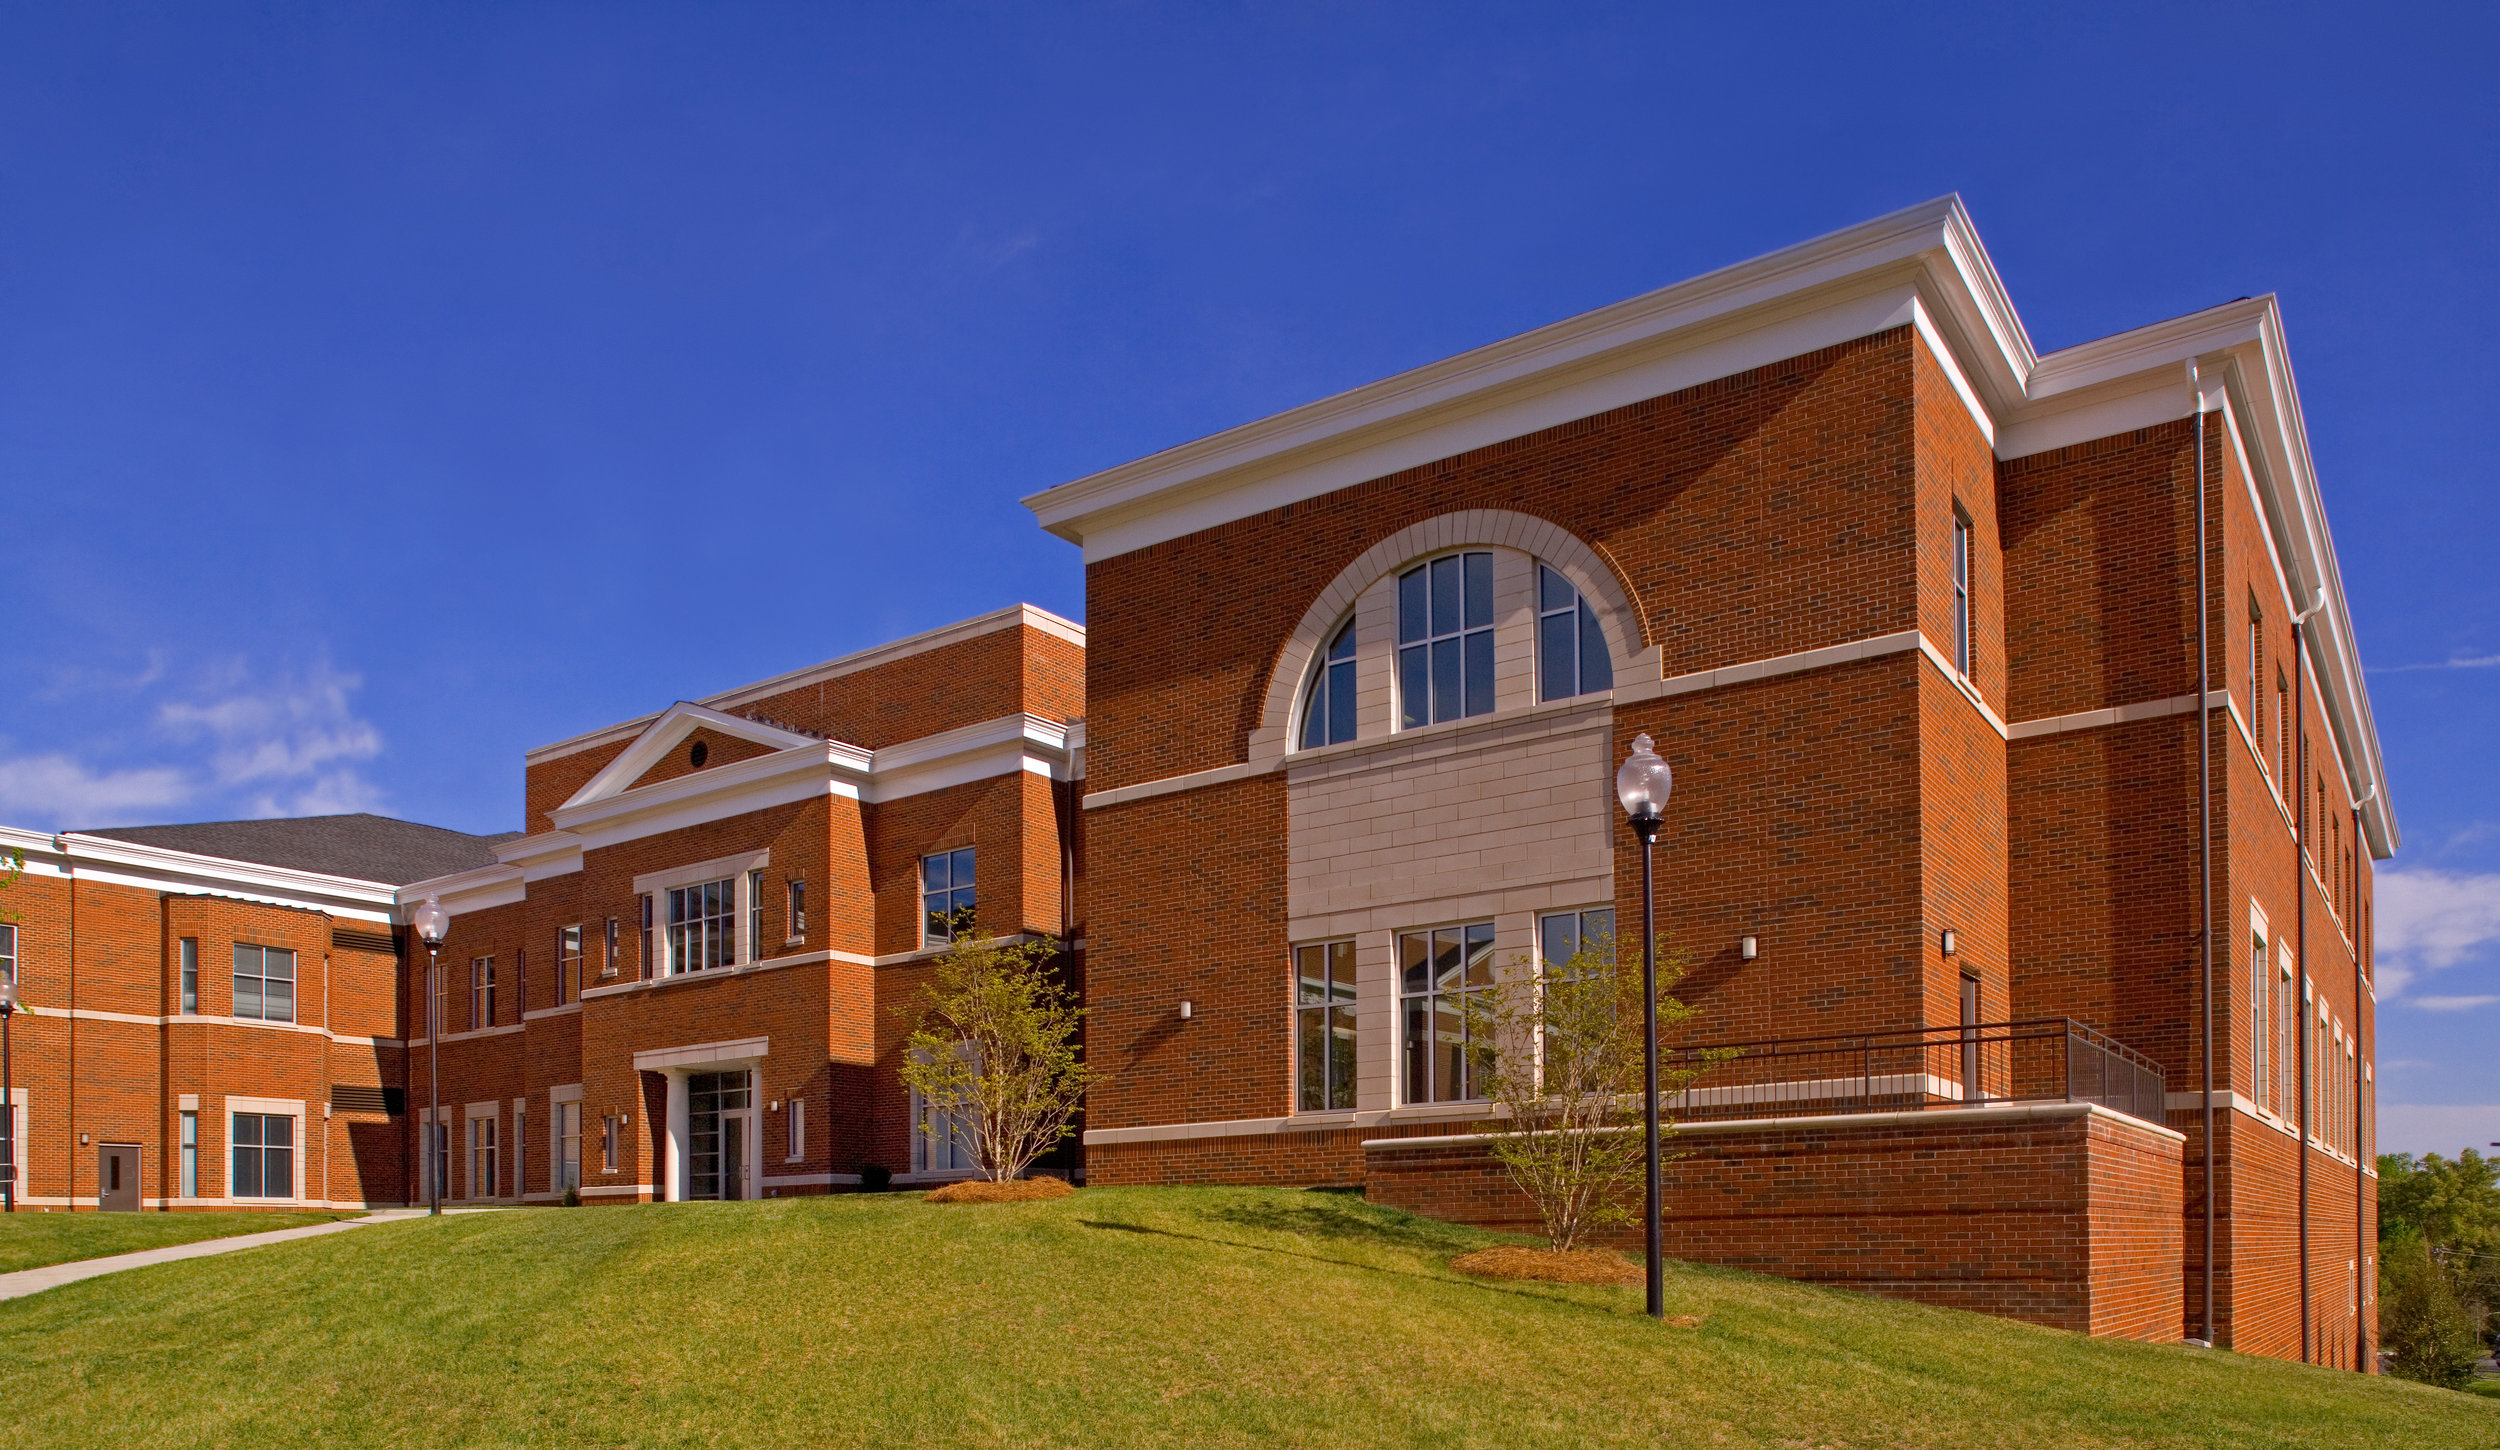 CPCC Cato Campus Phase II